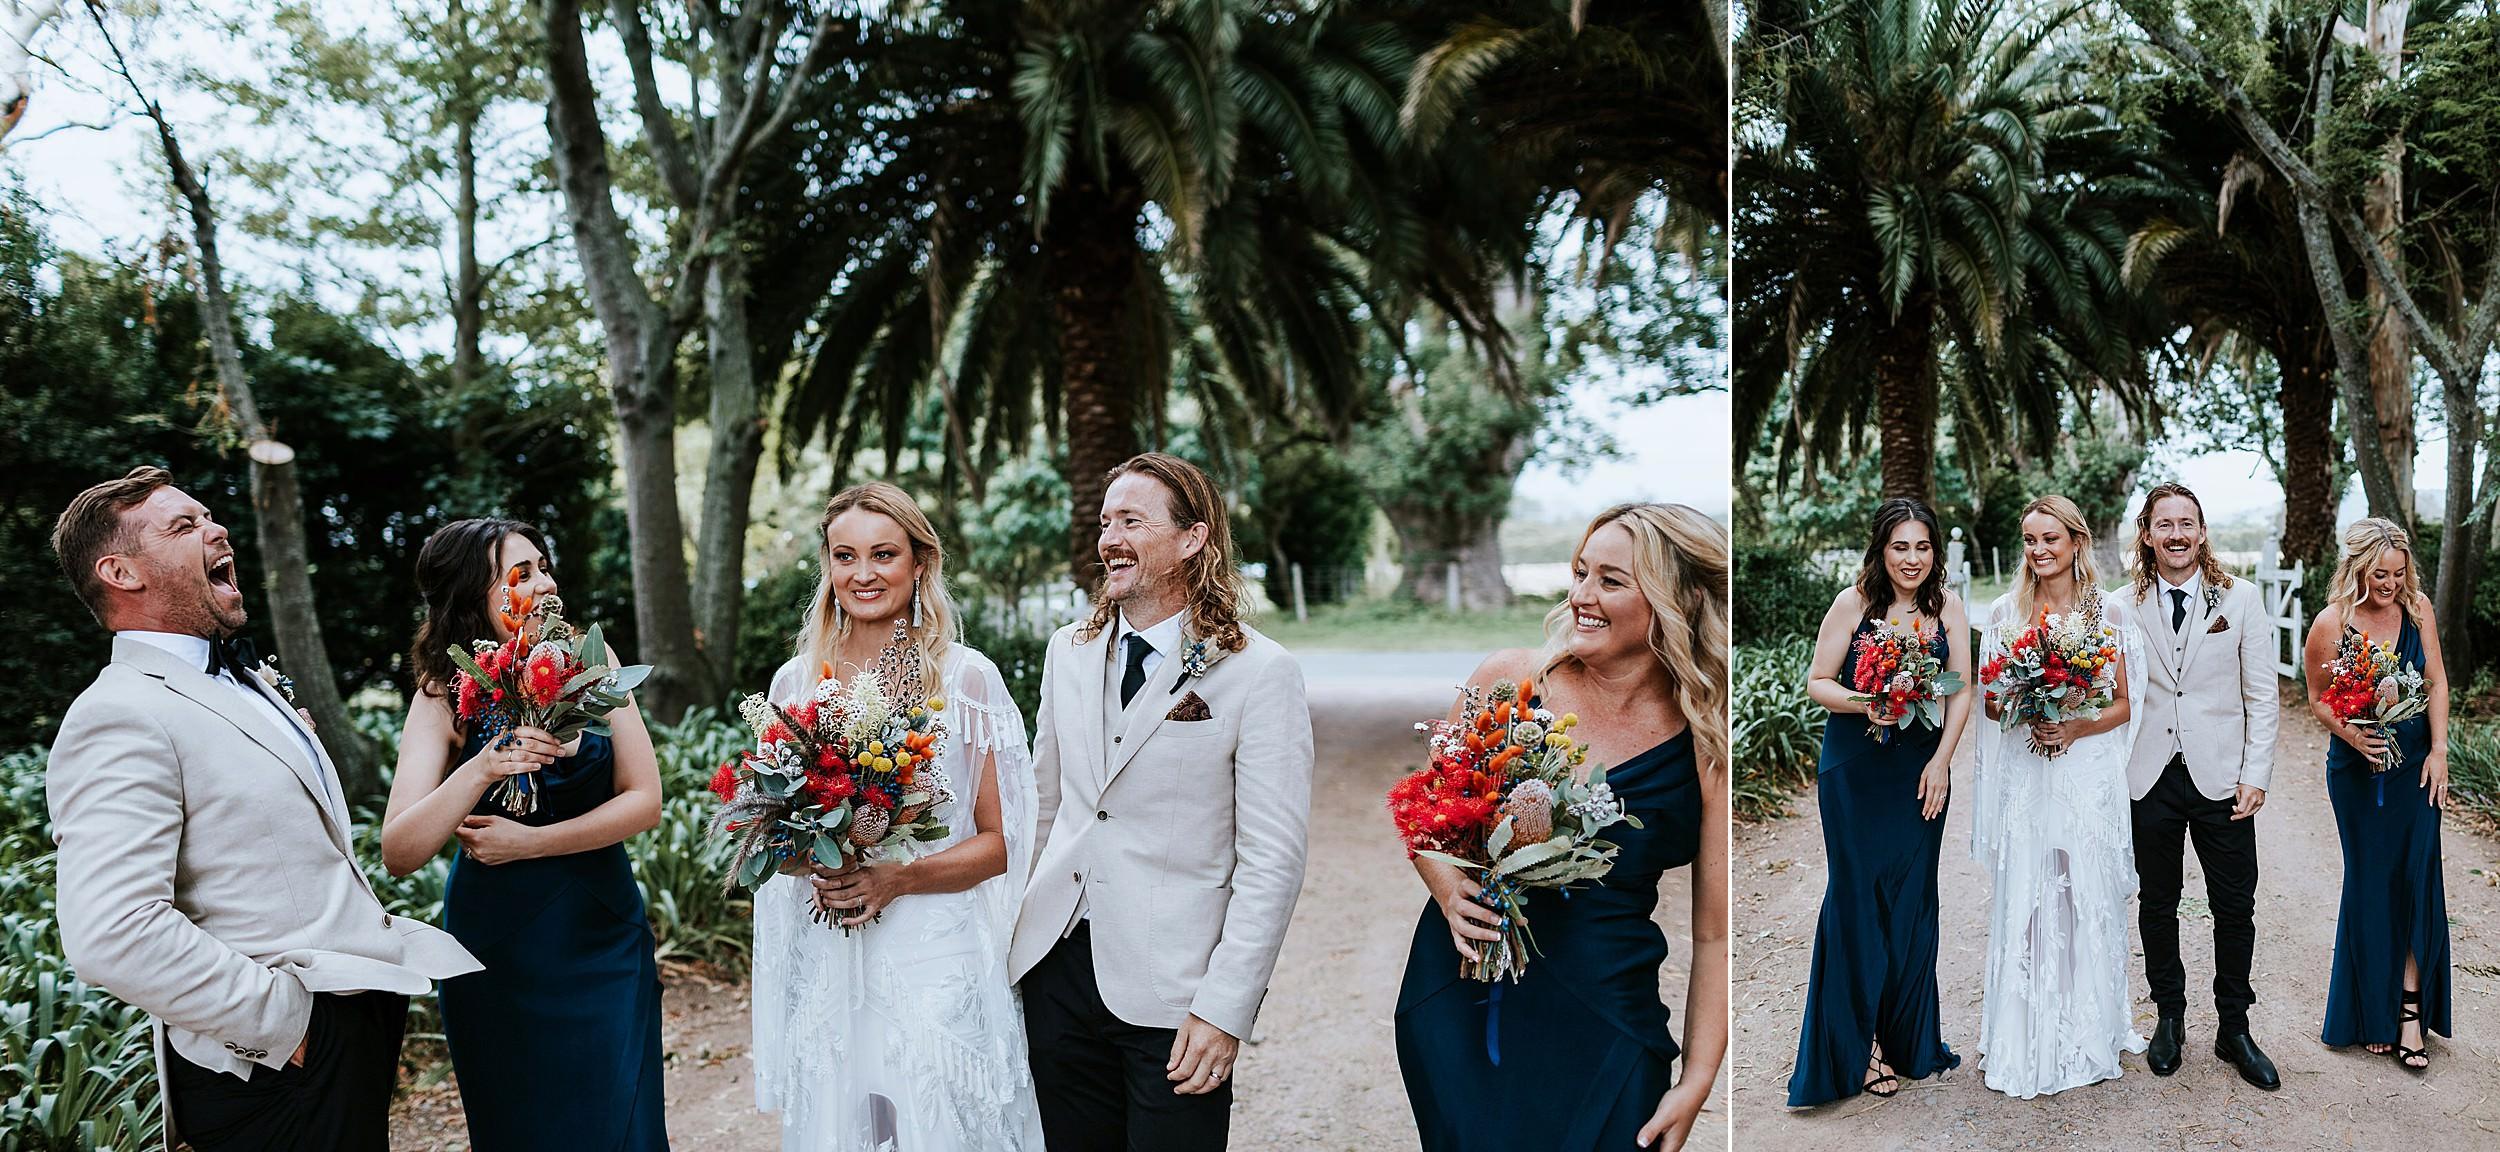 wedding_the_woolshed_steph_zac_0116.jpg